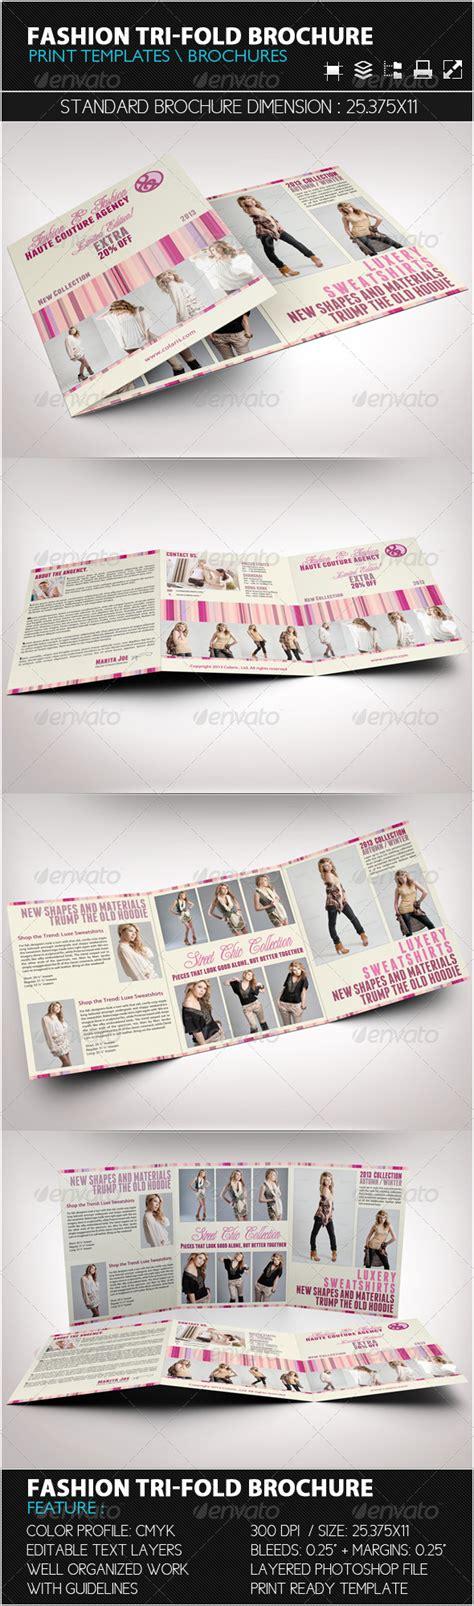 fashion brochure template fashion tri fold brochure template by bagera graphicriver